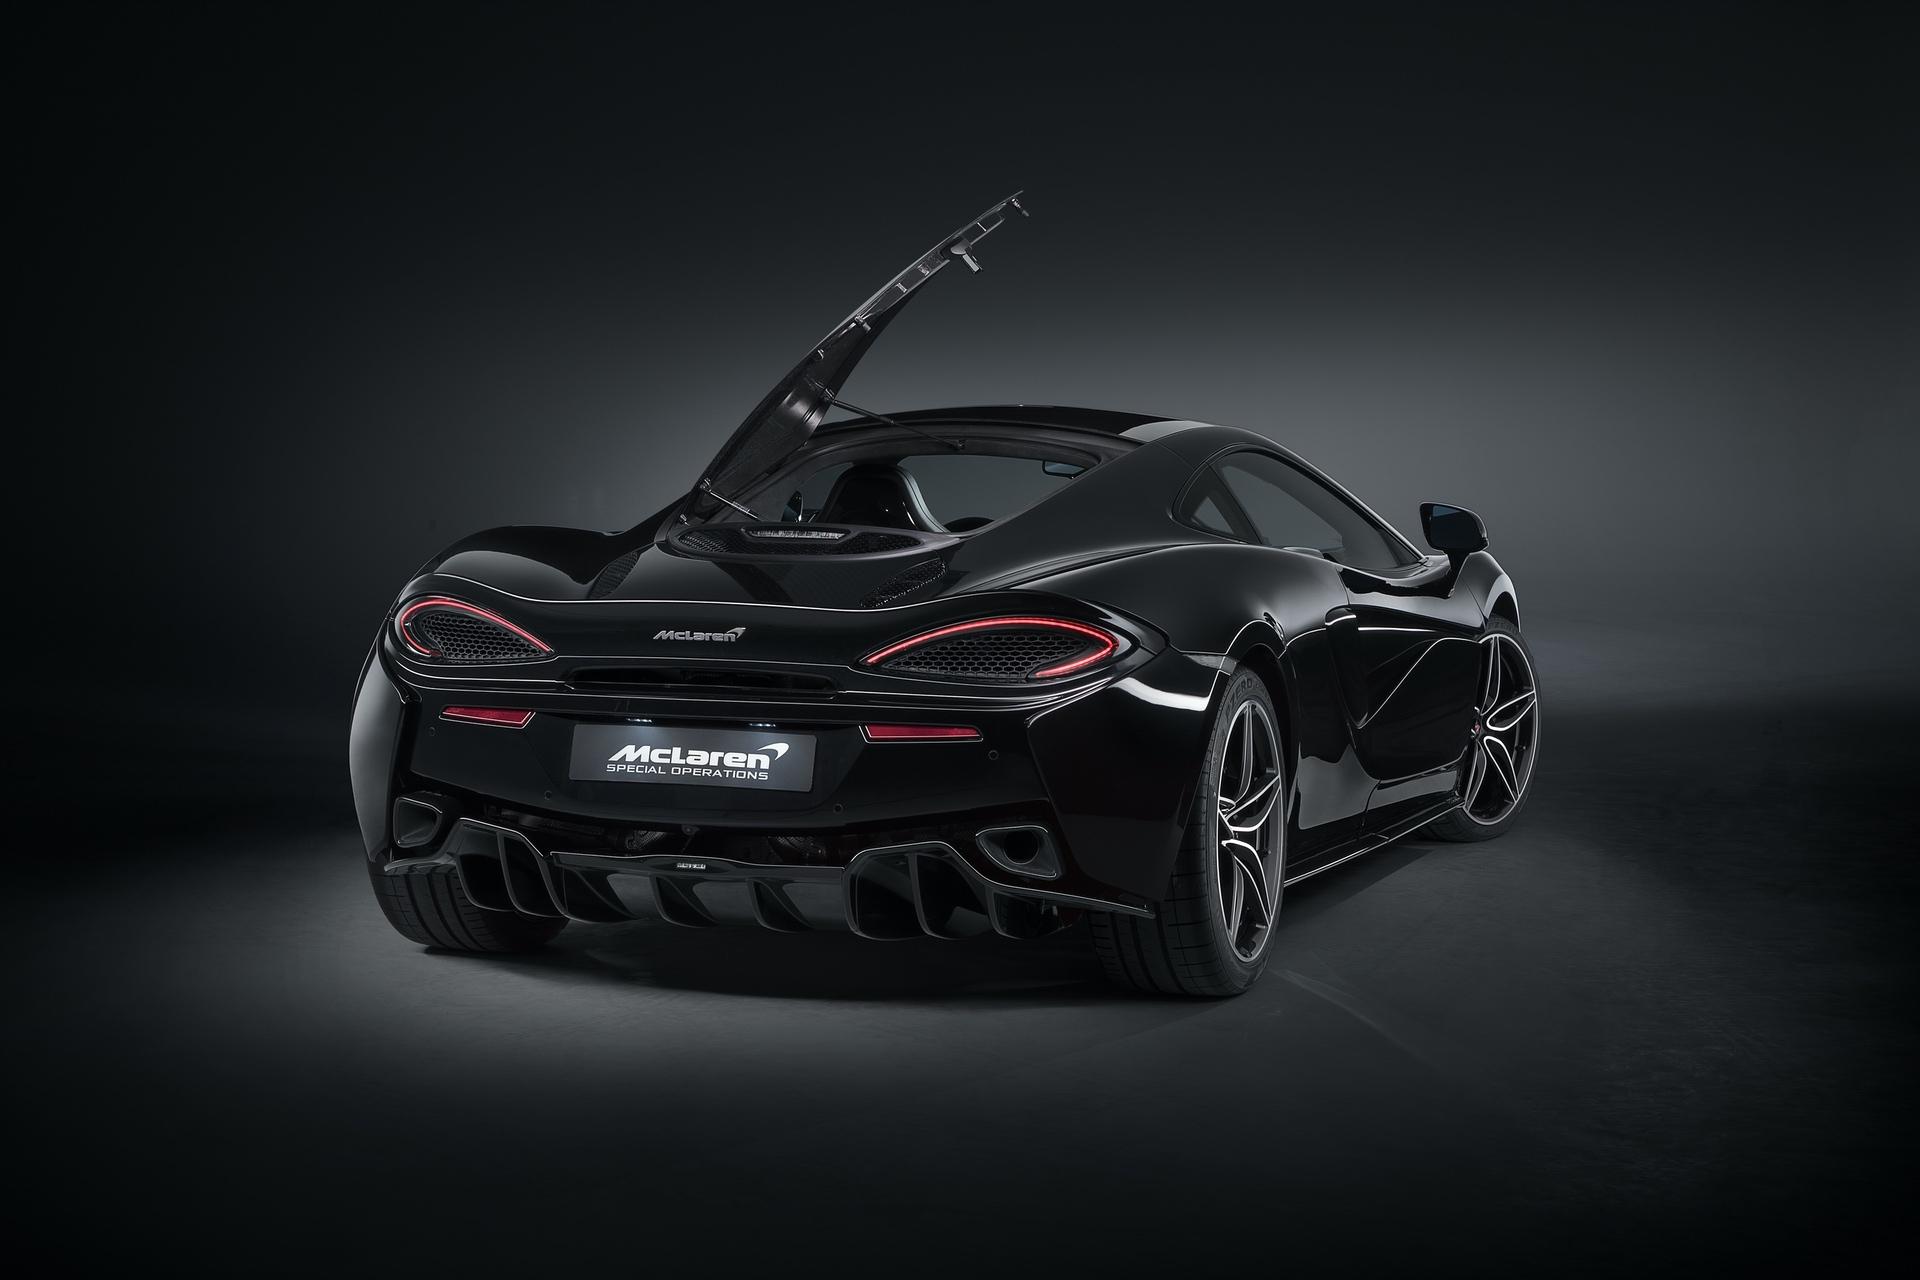 McLaren_570GT_MSO_Black_Collection_0002